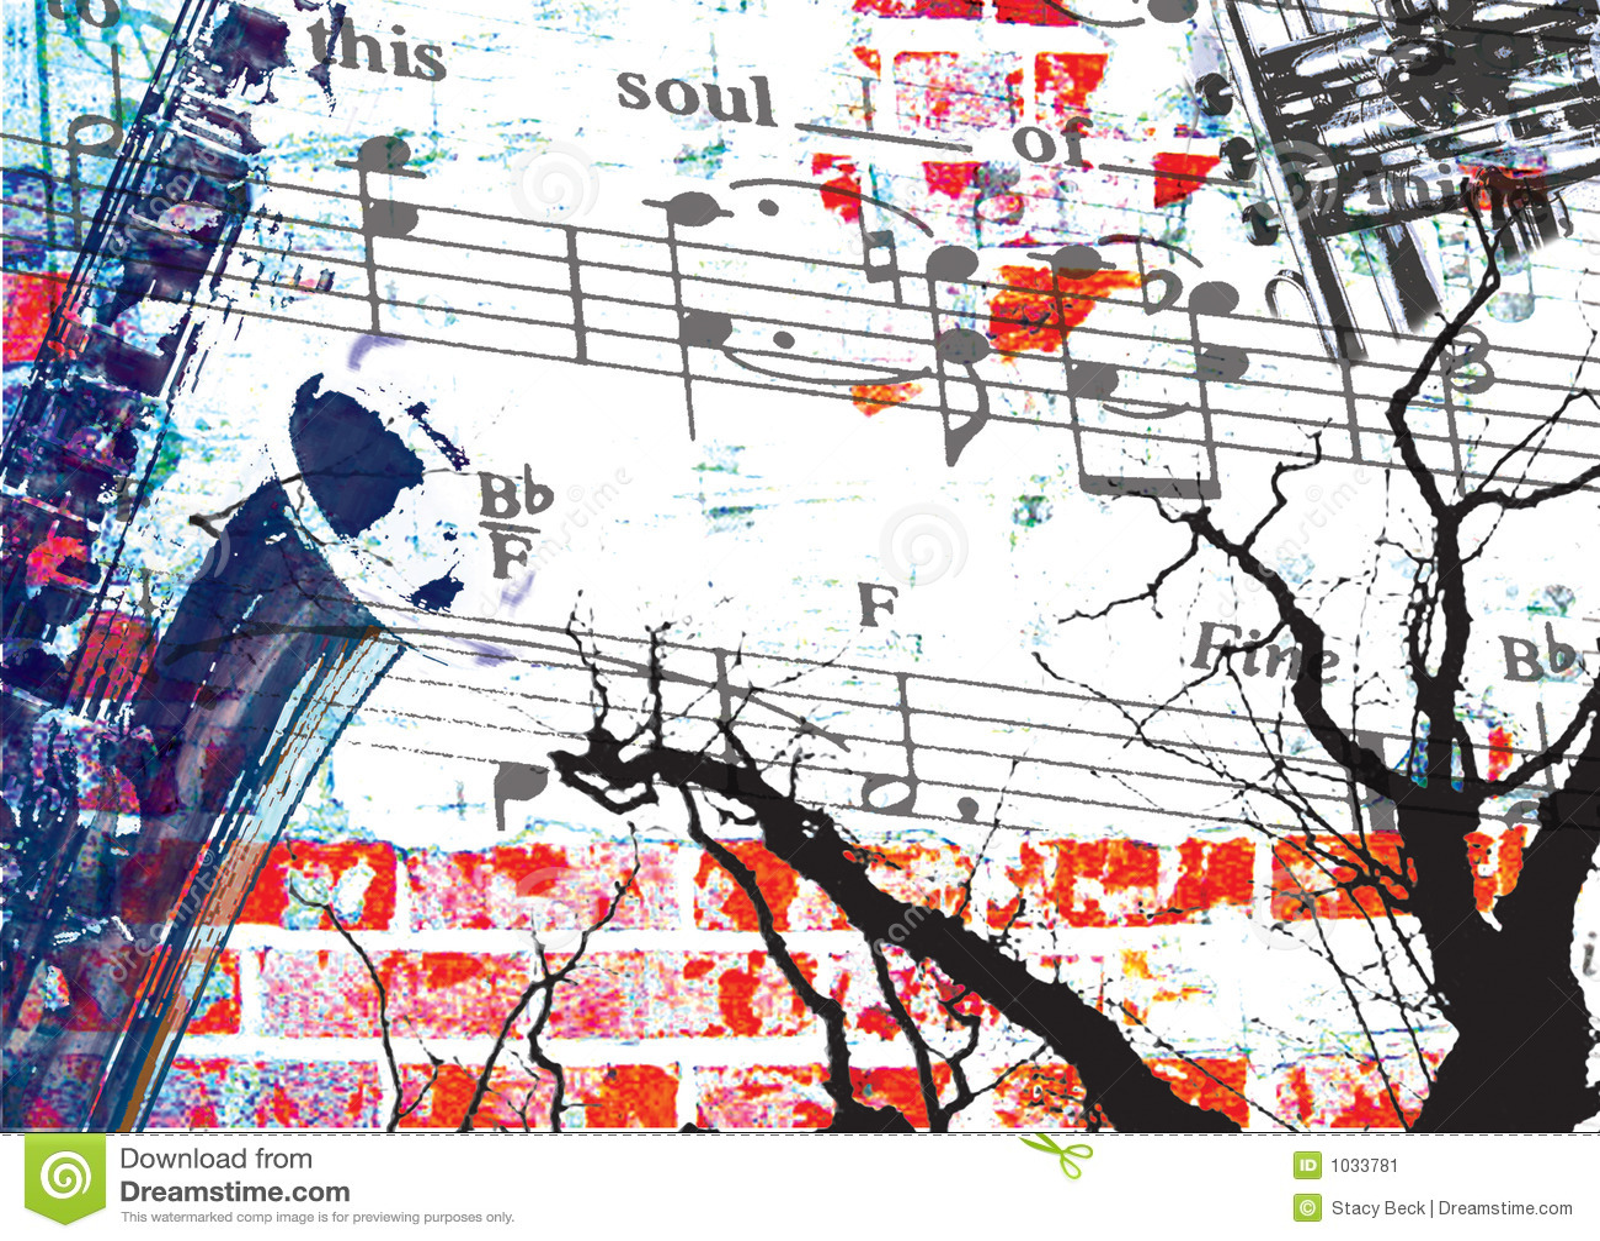 Muzyka soul